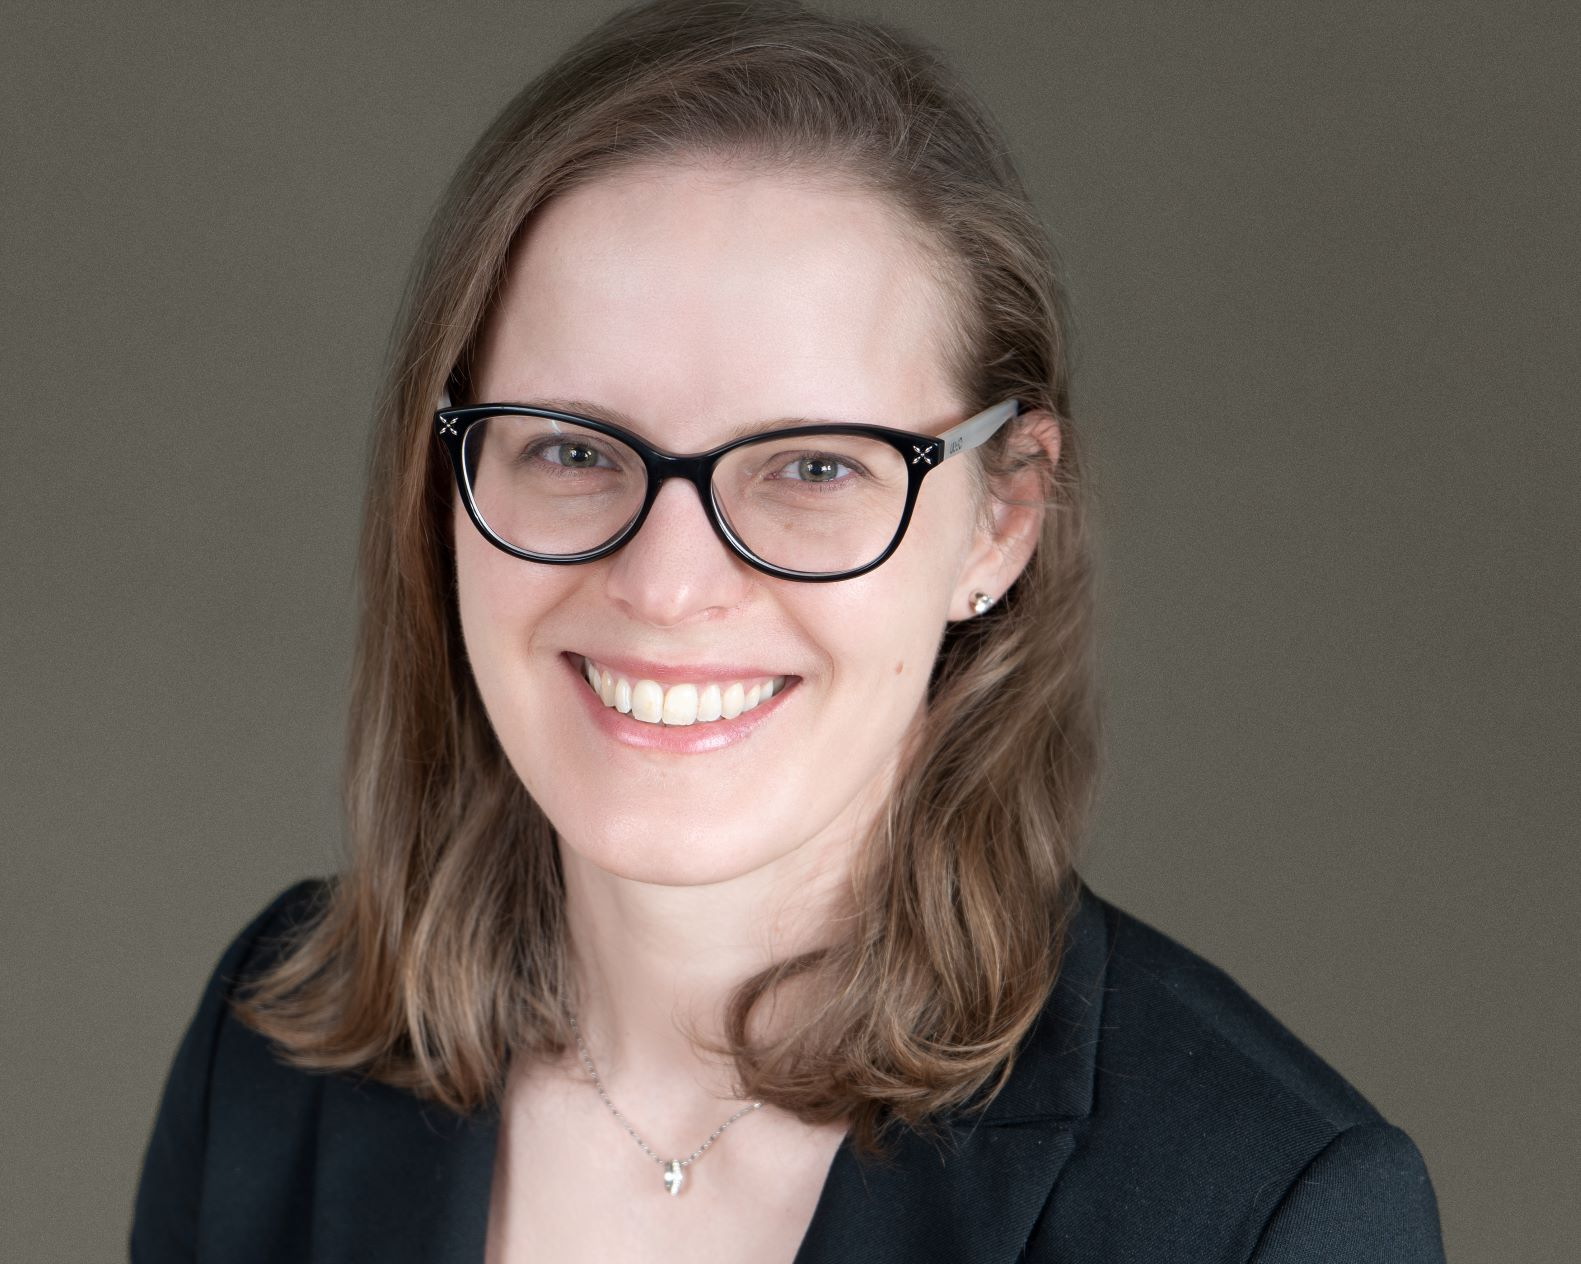 Professional portrait of Janine Oldham